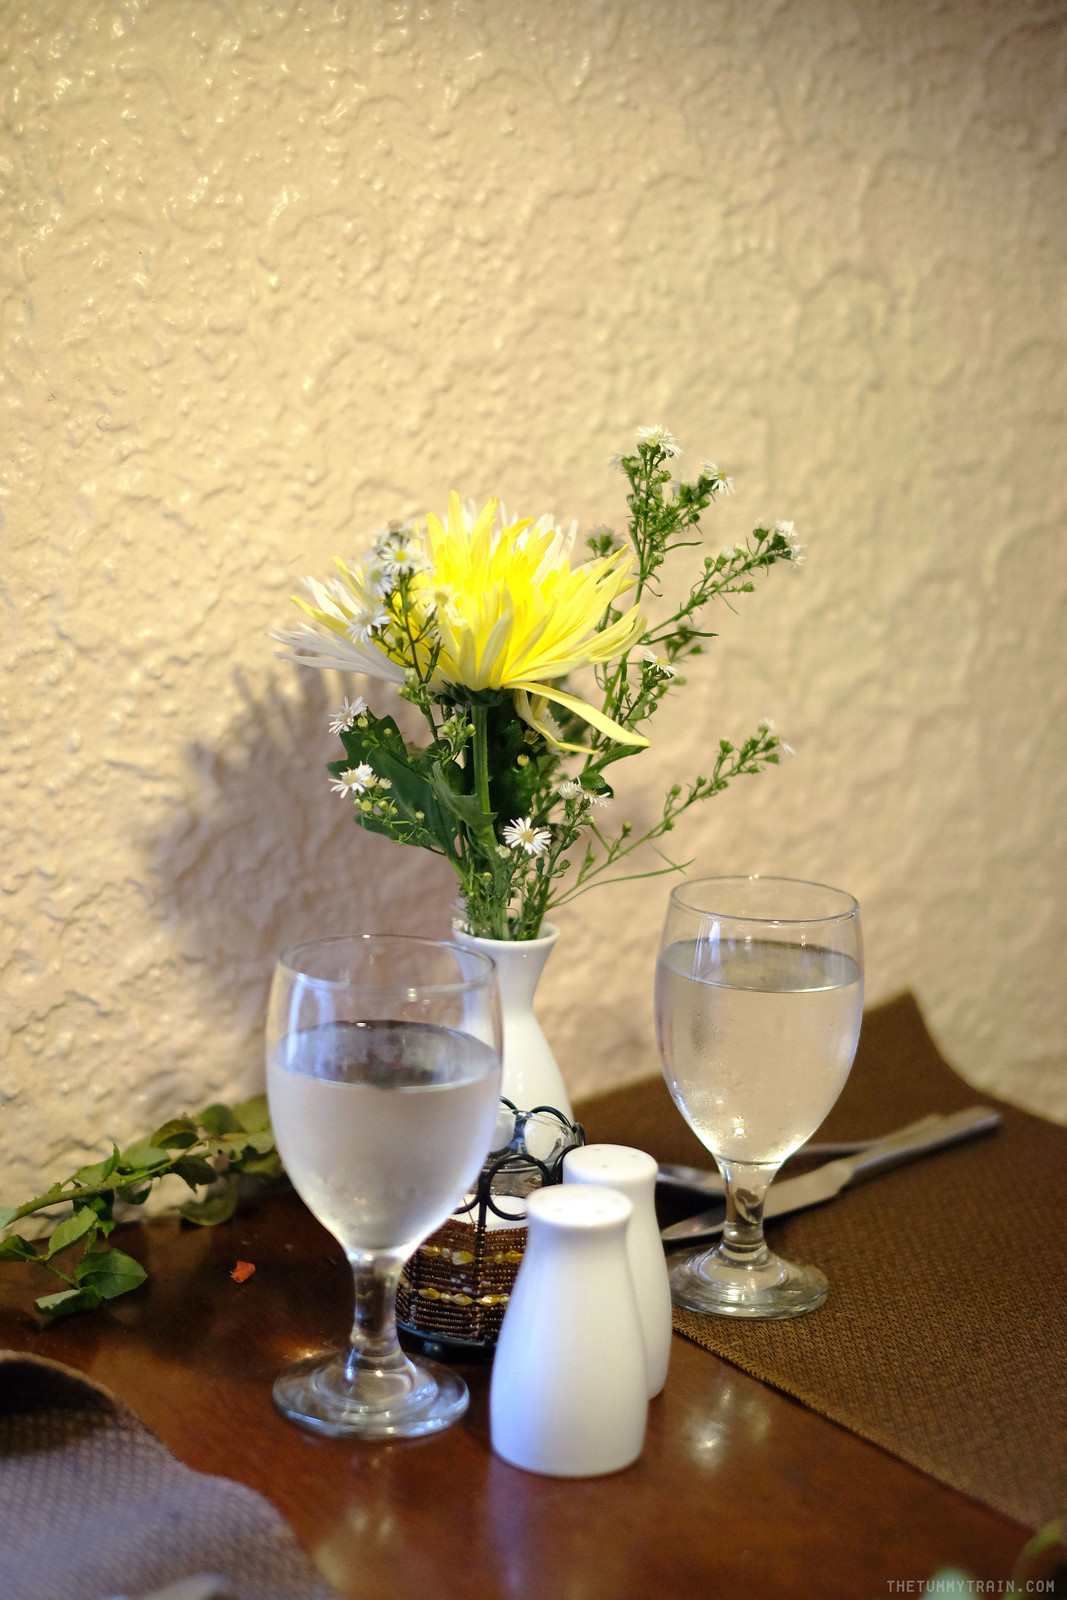 26877132736 dba1c85f34 h - A brief Mother's Day lunch at Alba Tomas Morato